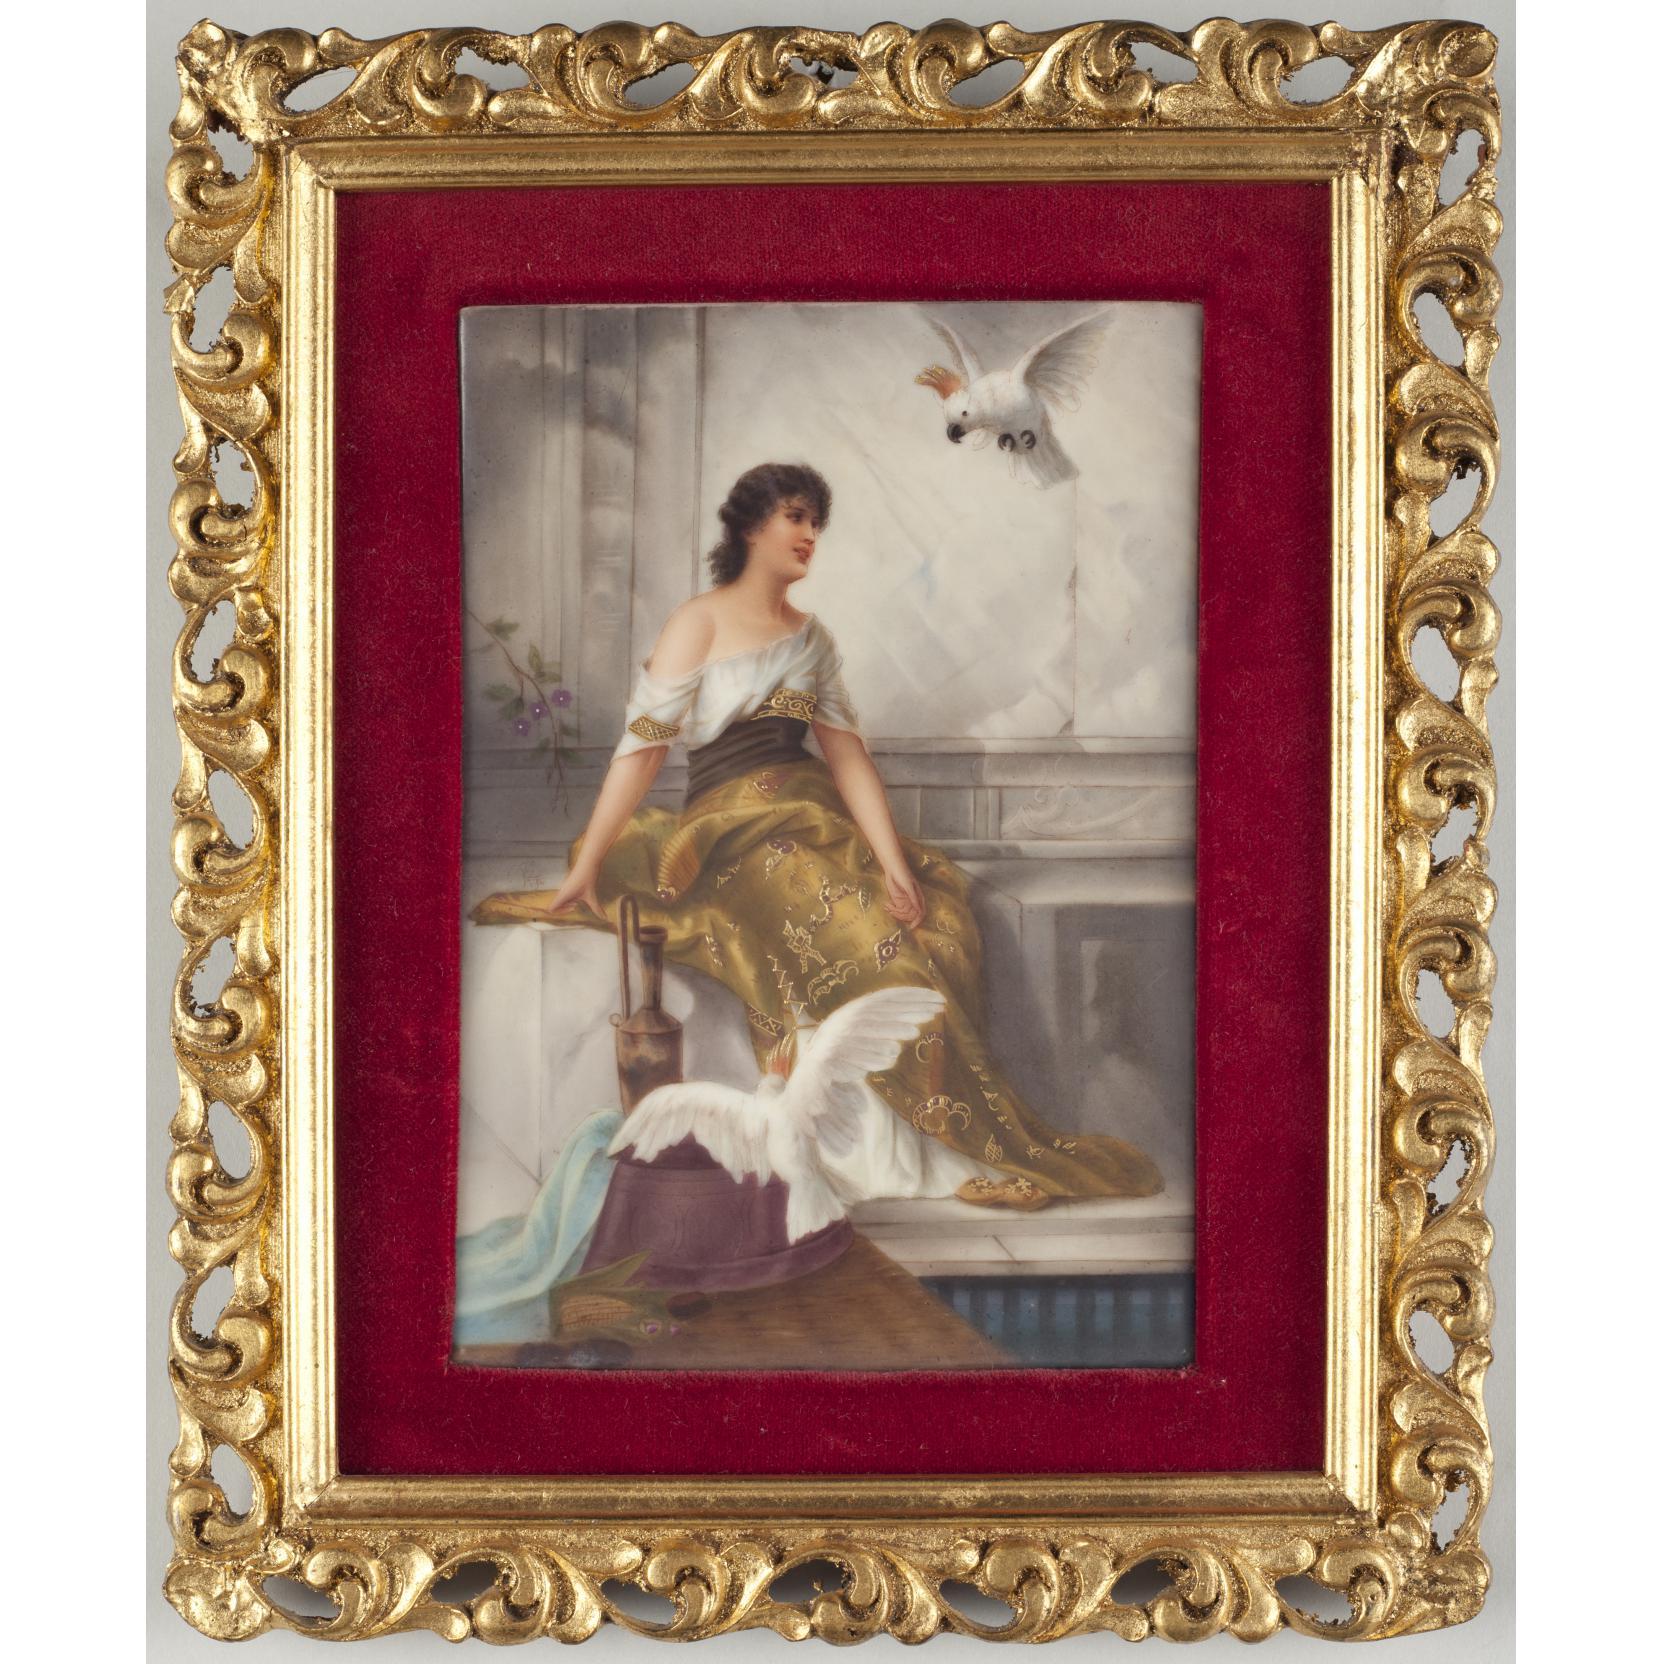 german-painting-on-porcelain-plaque